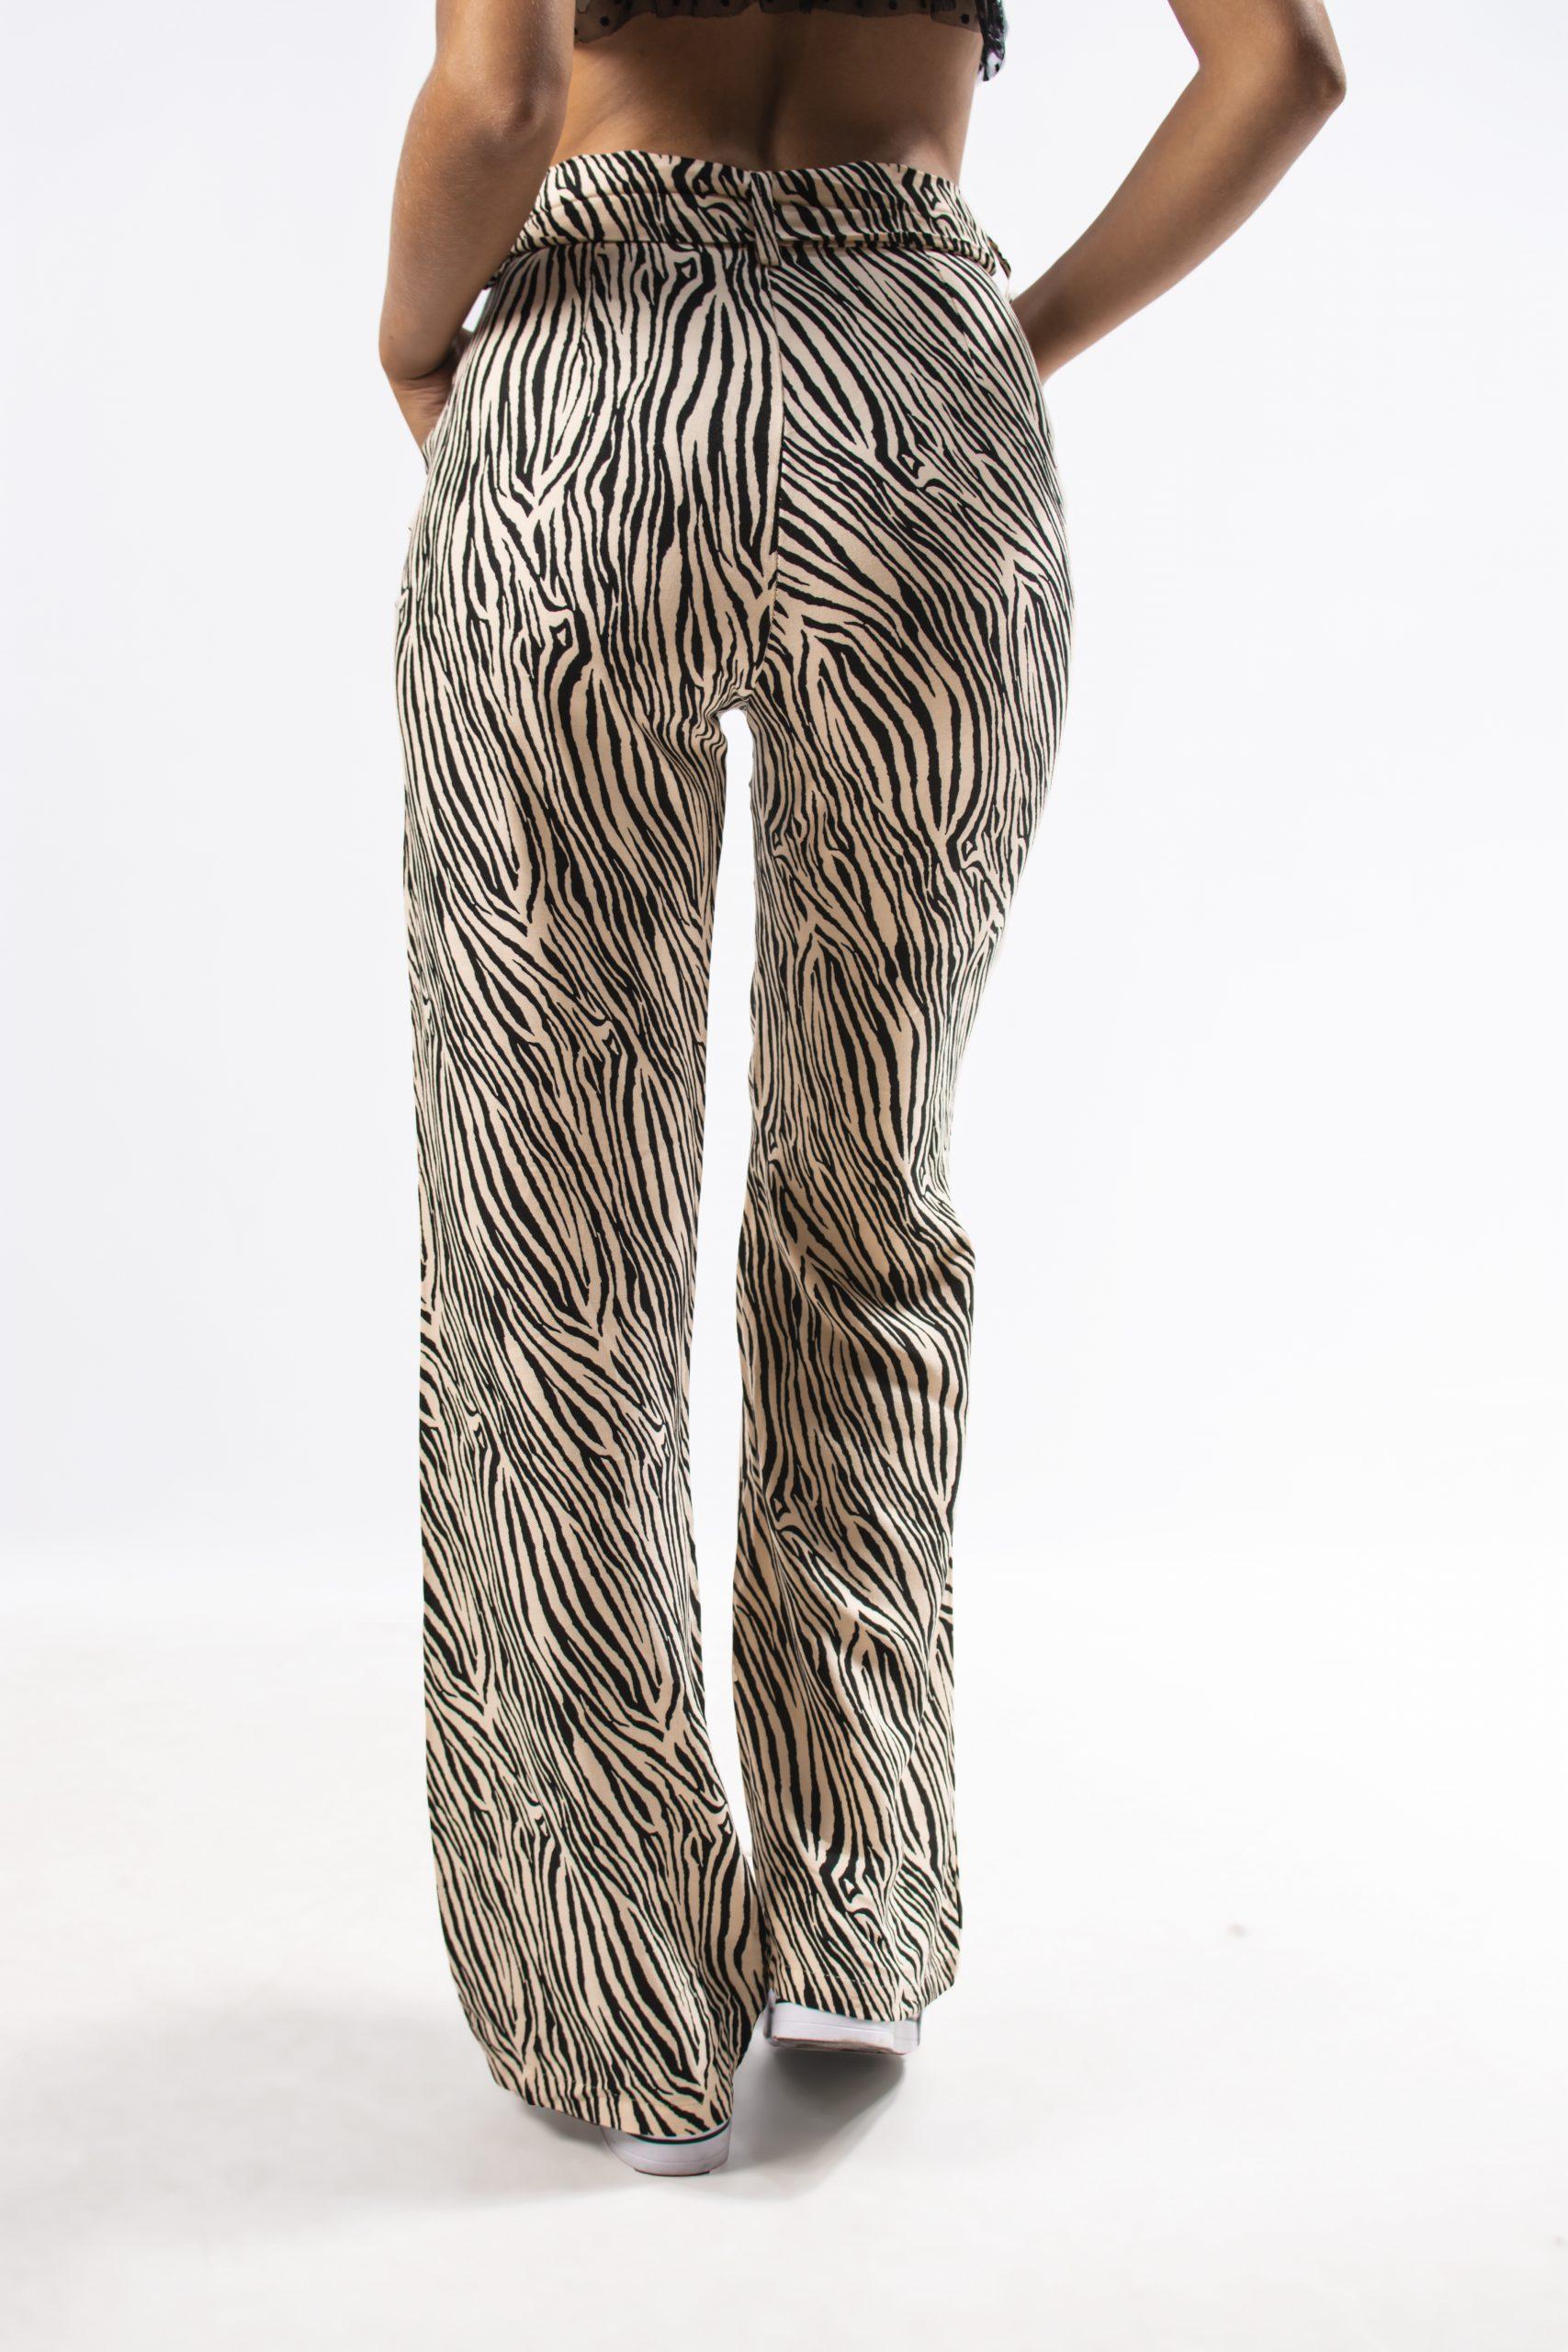 Pantalon Palazo Zinia Con Lazo Jc Moda Tienda Online